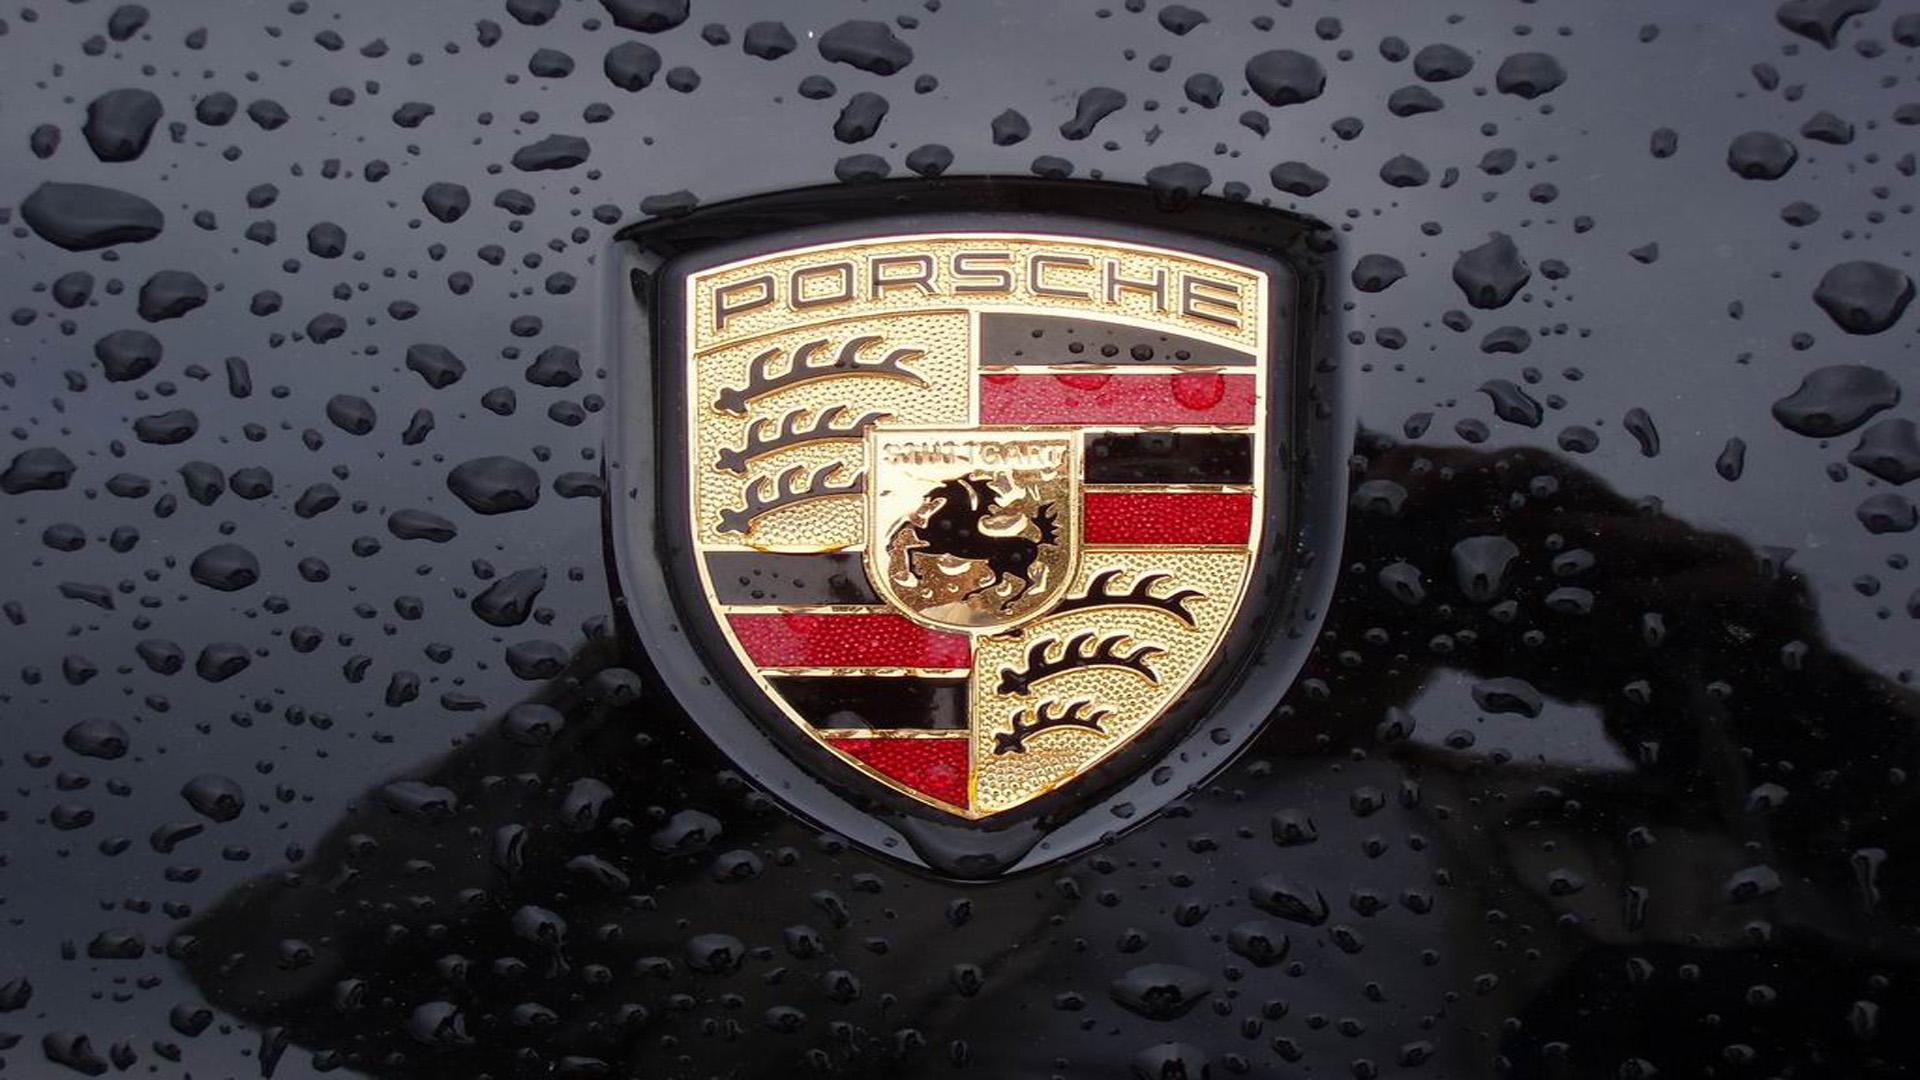 Porsche Logo Wallpapers Pictures Images 1920x1080